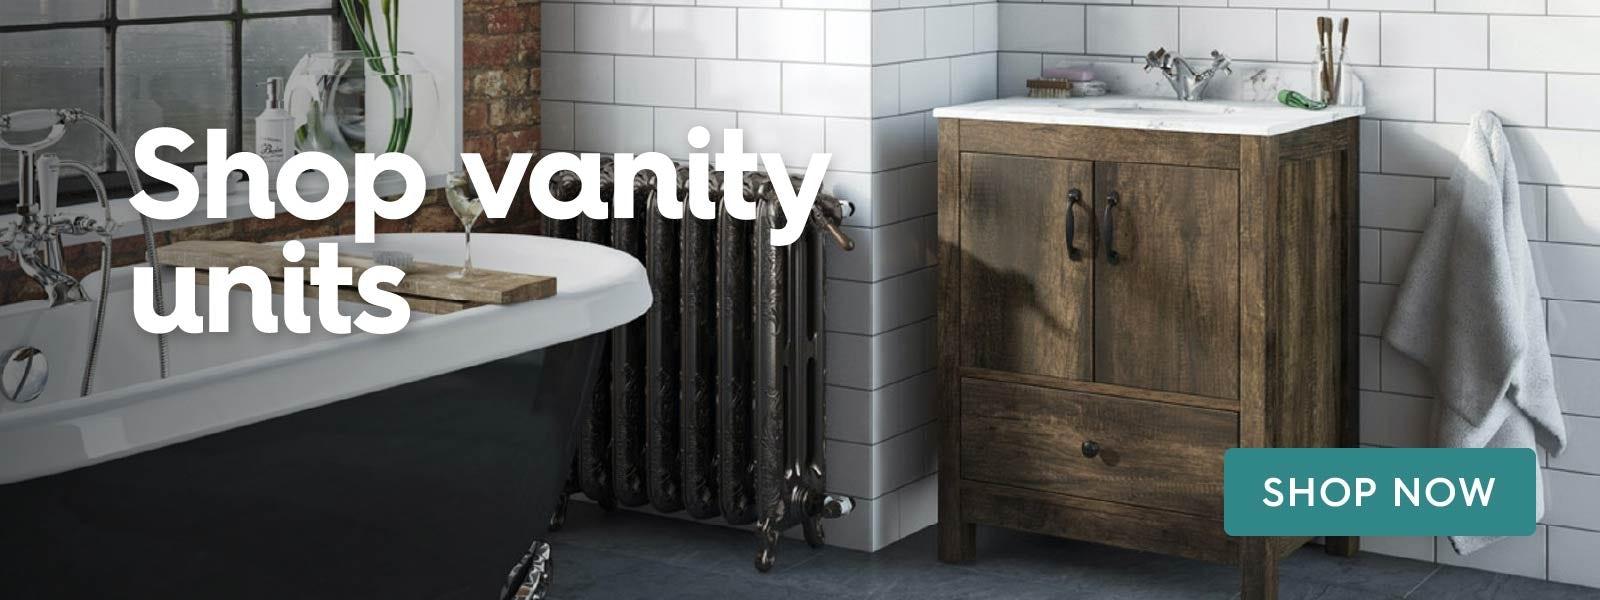 Shop vanity units